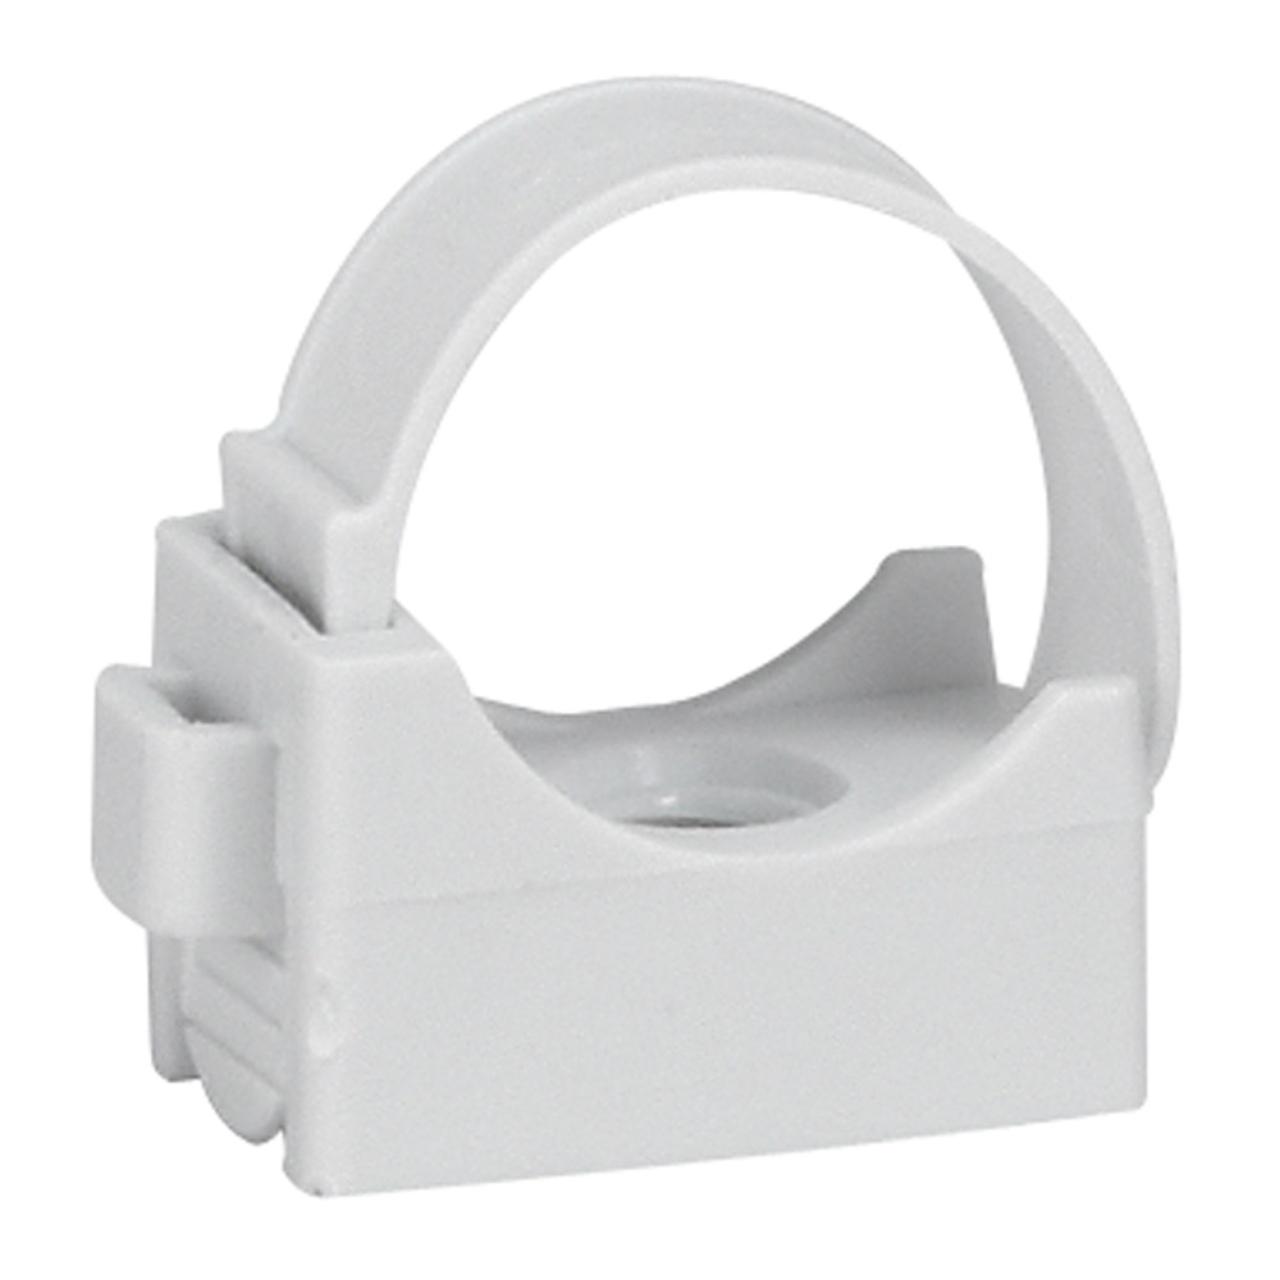 coller legrand clipsotube pour tube irl de 20 mm boite de. Black Bedroom Furniture Sets. Home Design Ideas